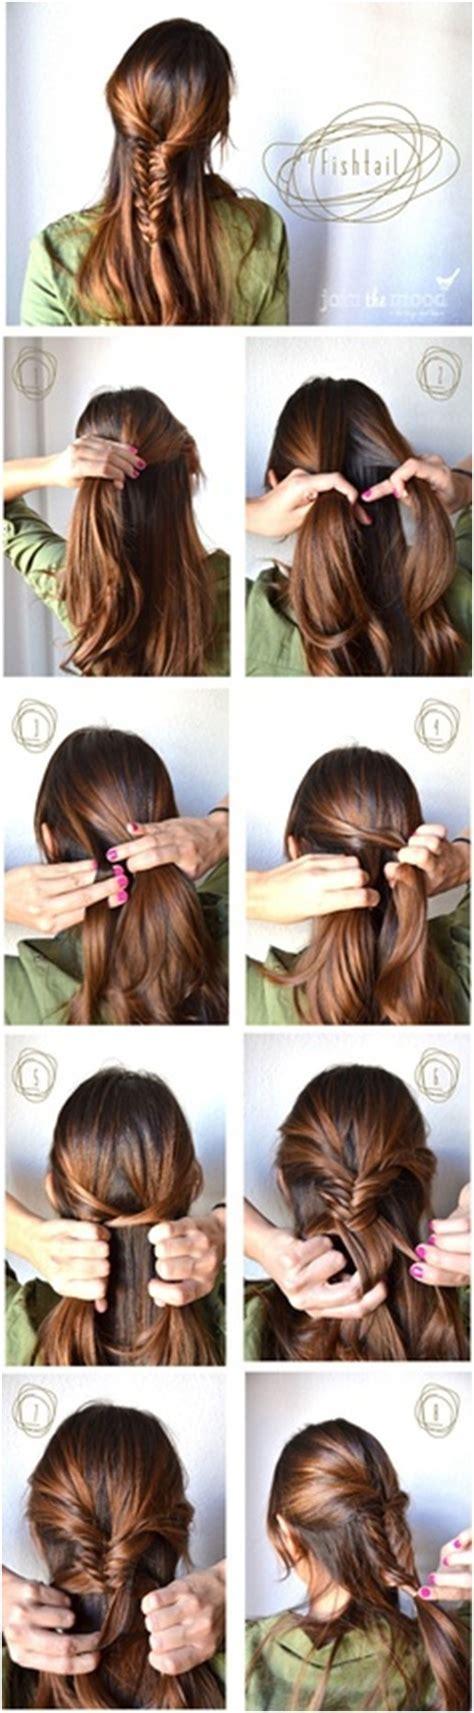 braided hairstyles diy fishtail braided hairstyles tutorials trendy hairstyles